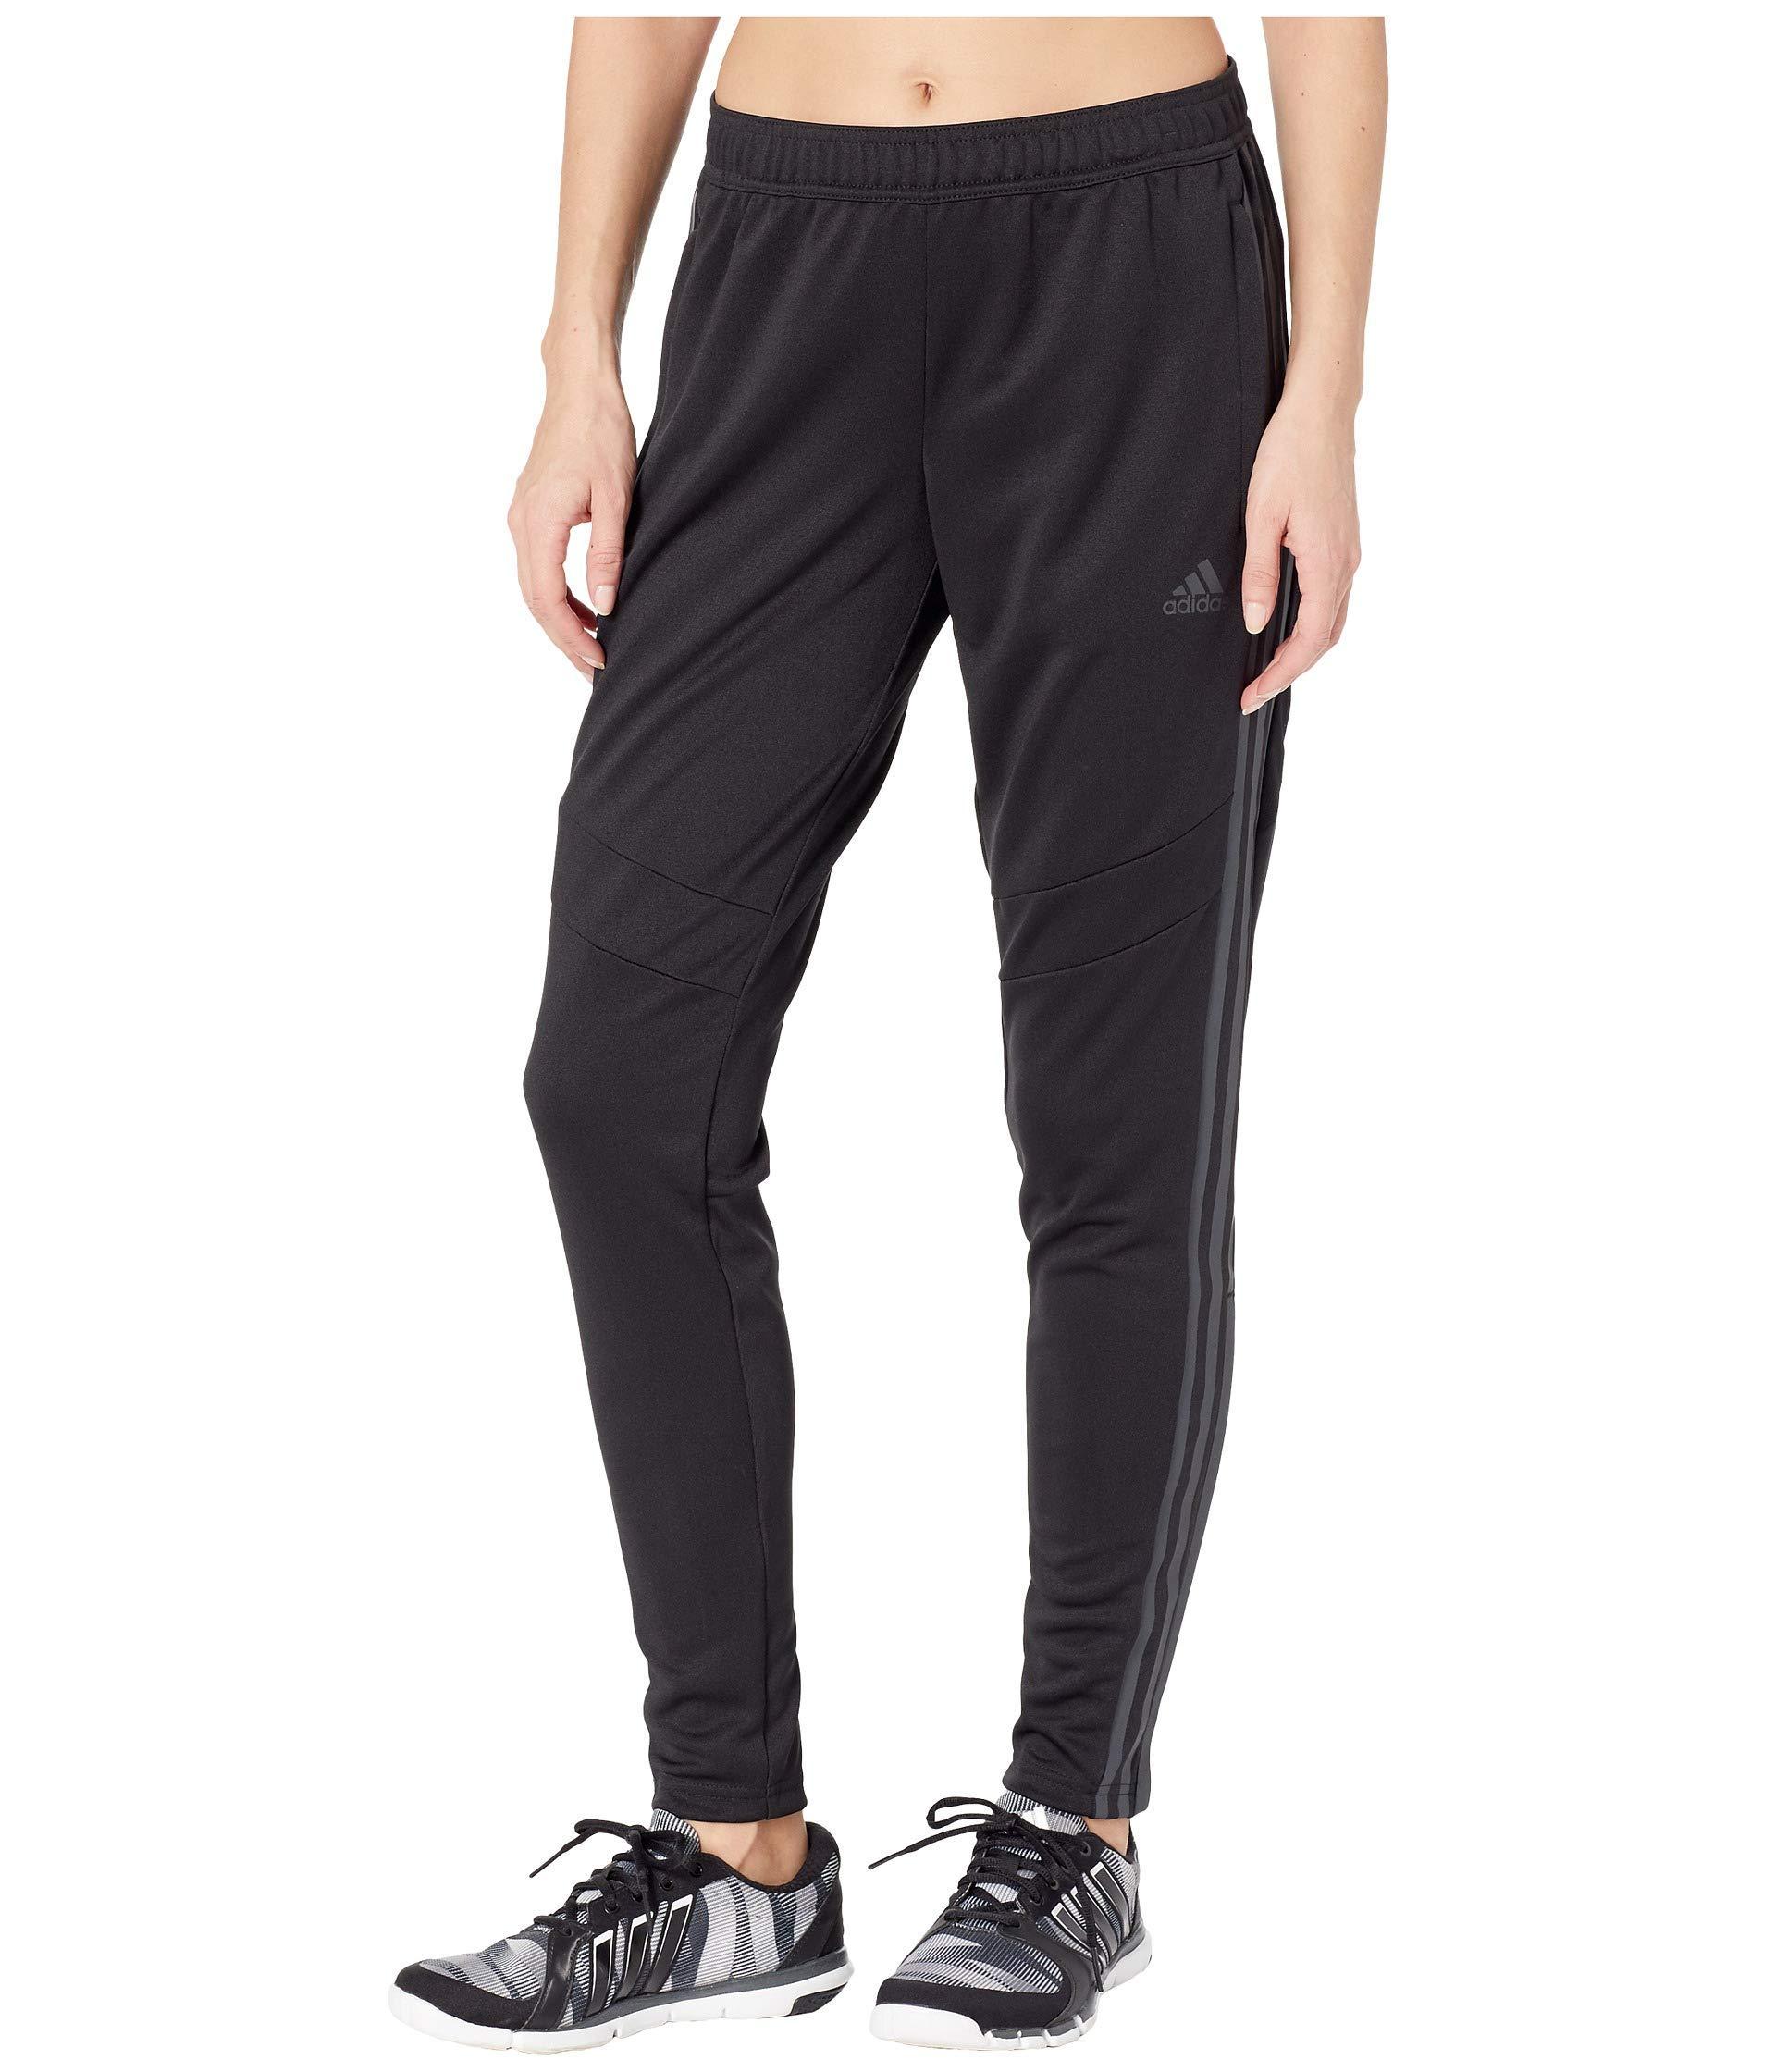 adidas Women's Soccer Tiro 19 Training Pant, XX-Small